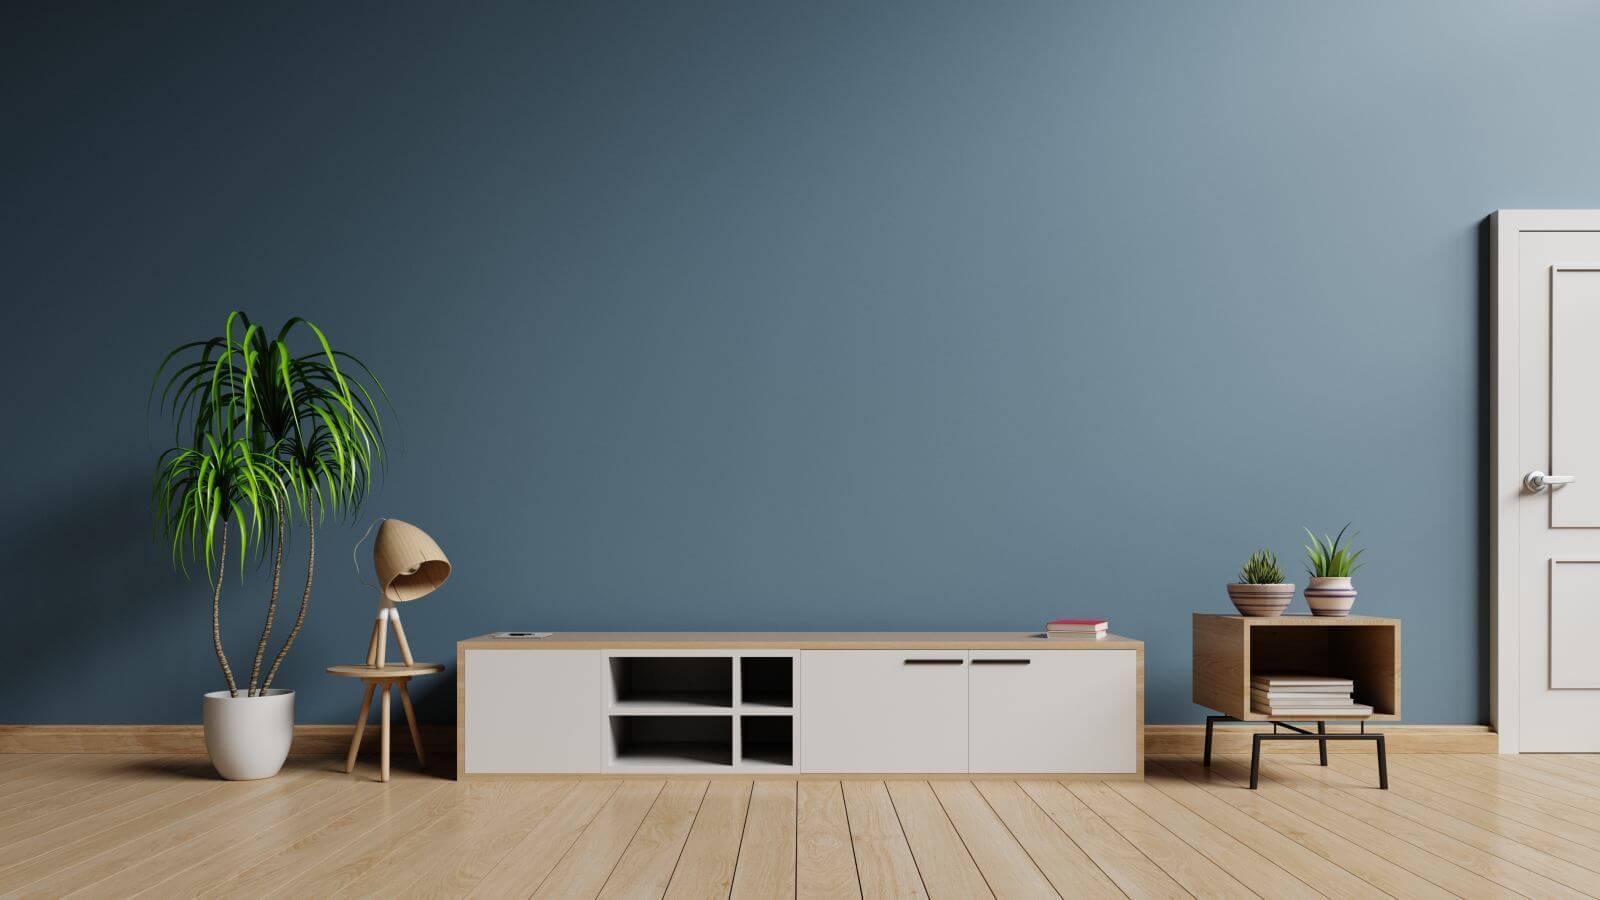 Tv cabinet in modern empty room on wooden floor and wall dark background, 3d rendering